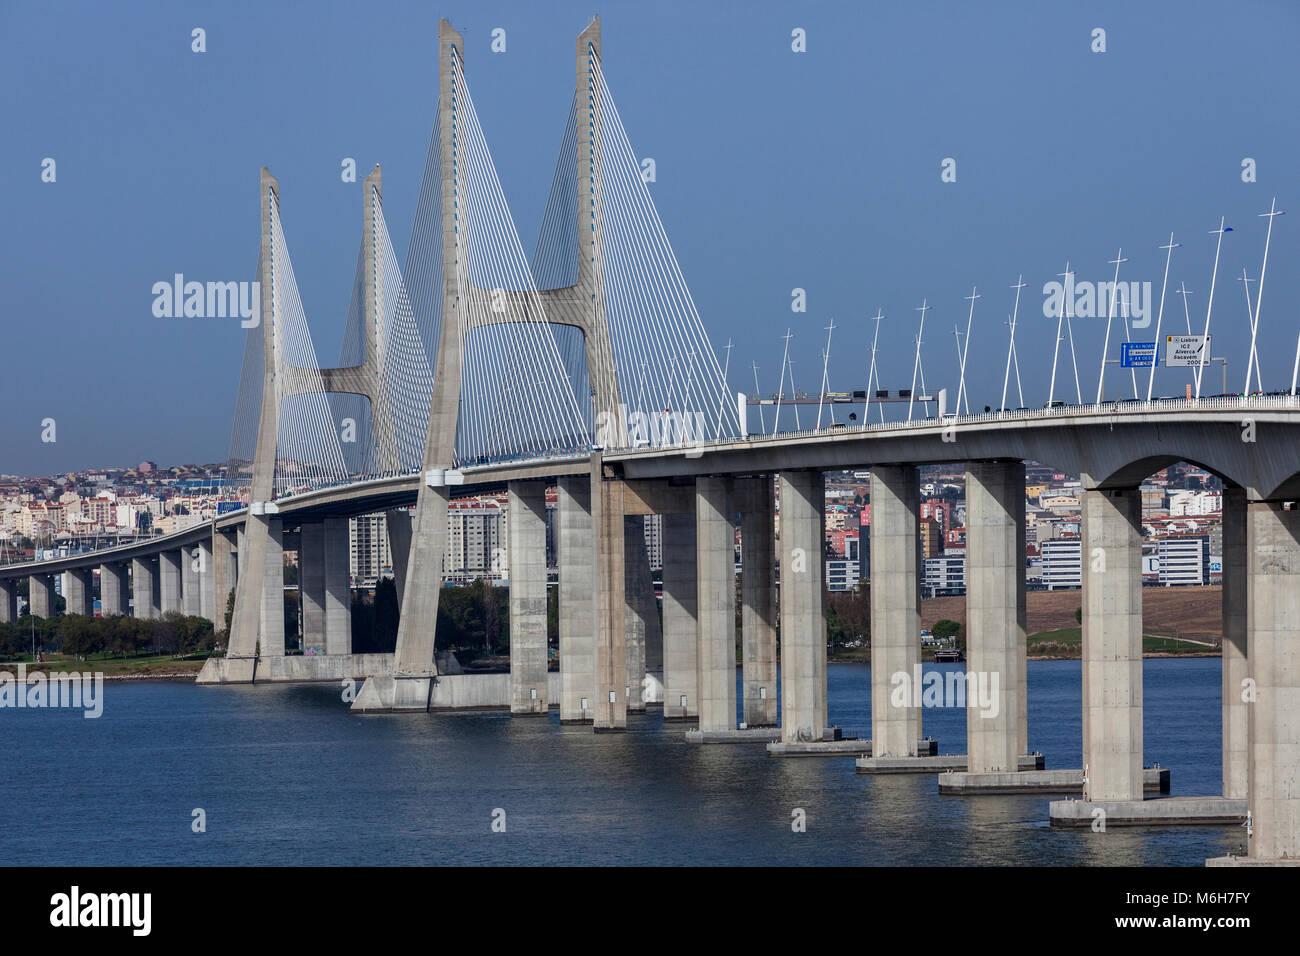 Unusual view to the main part of Vasco da Gama Bridge in Lisbon, Portugal - Stock Image